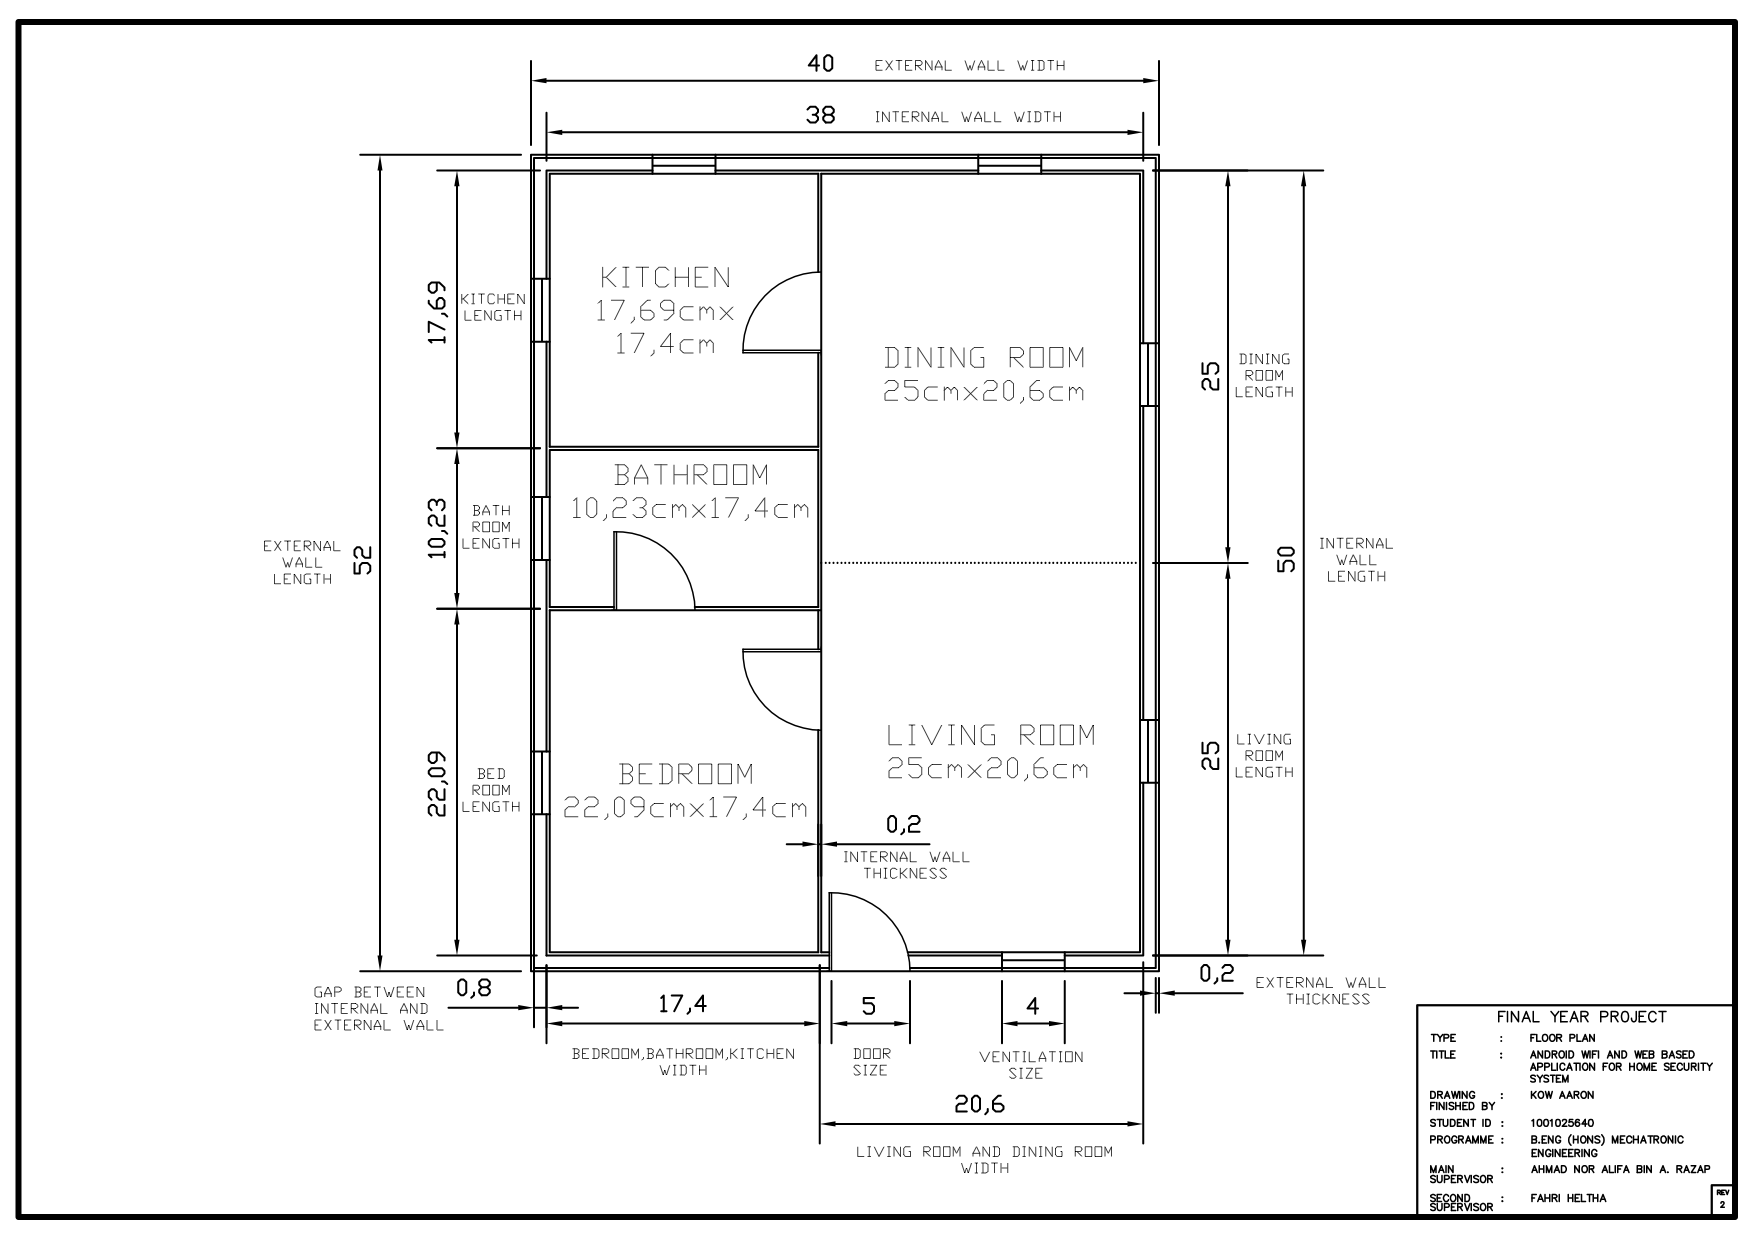 Fyp homesecuritysystem floor plan design